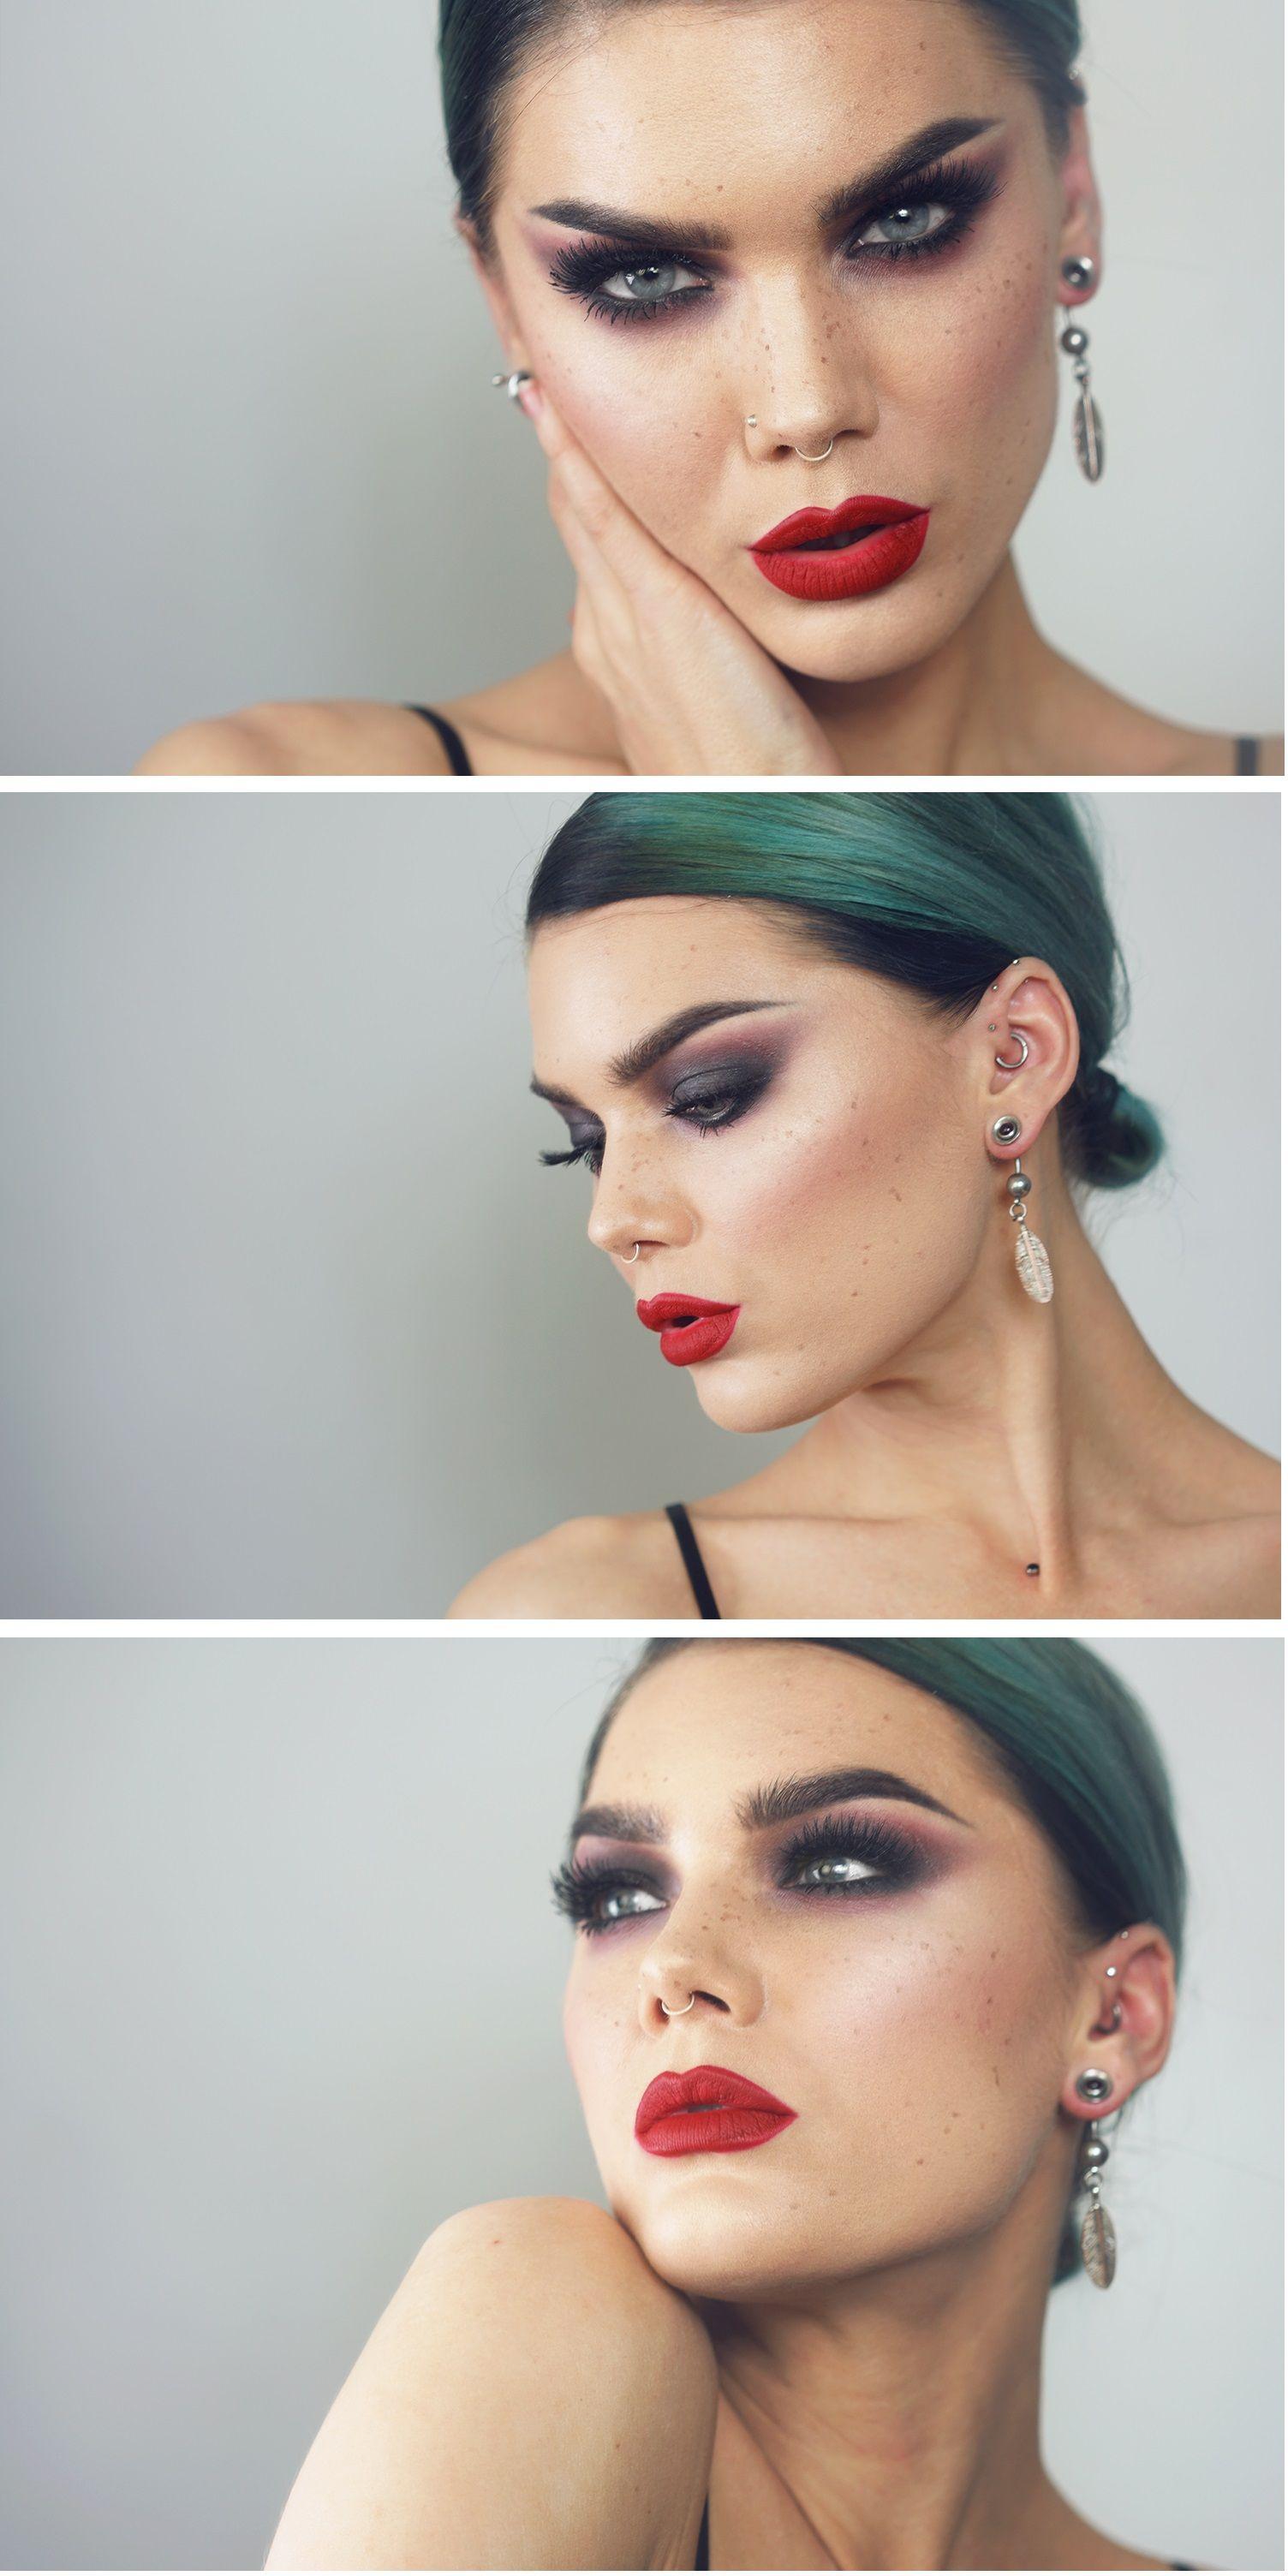 Pinwheel Makeup by Linda Hallberg The Pinterest Makeup